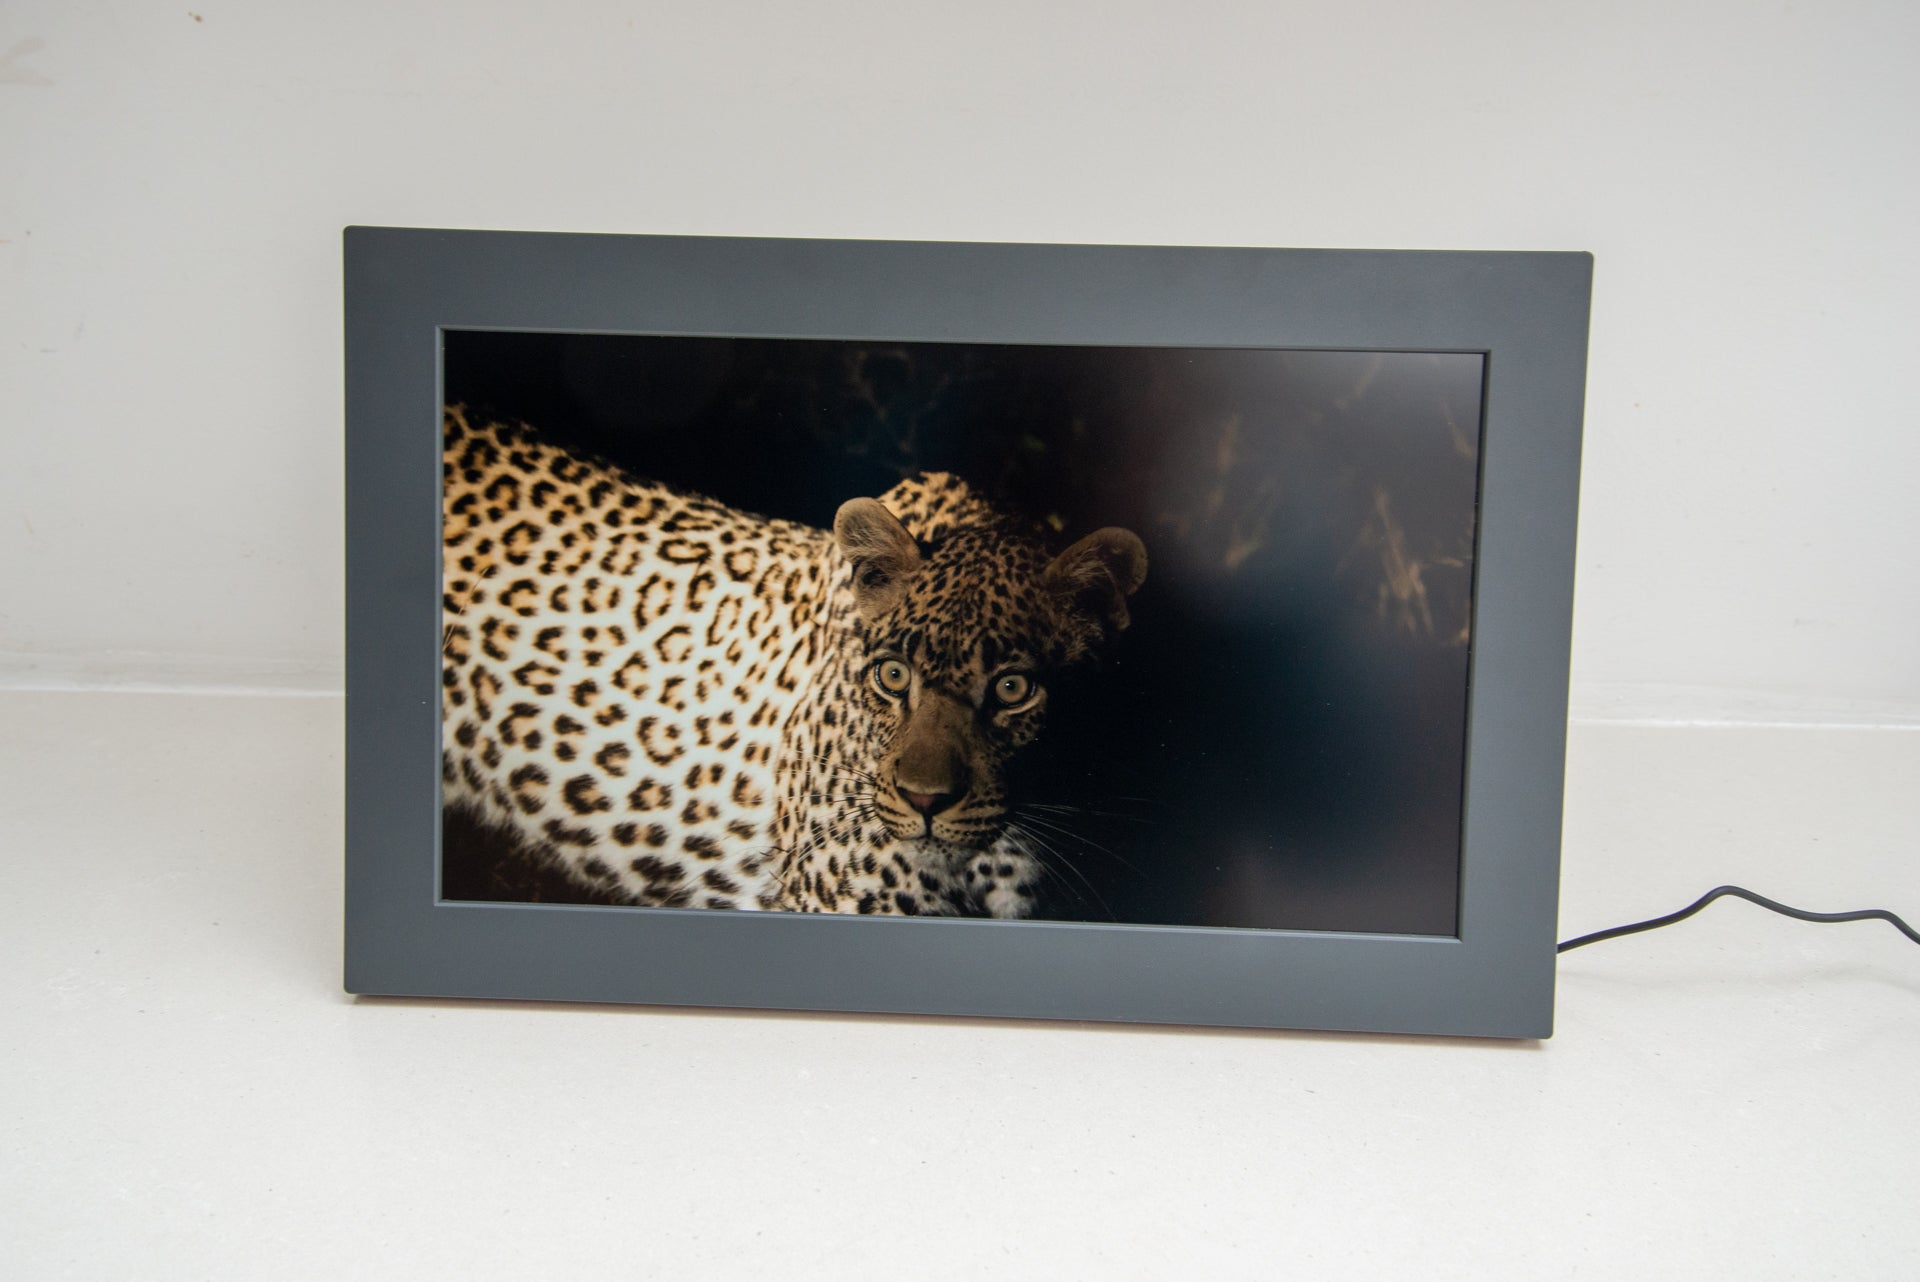 Netgear Meural WiFi Photo Frame Review | Trusted Reviews